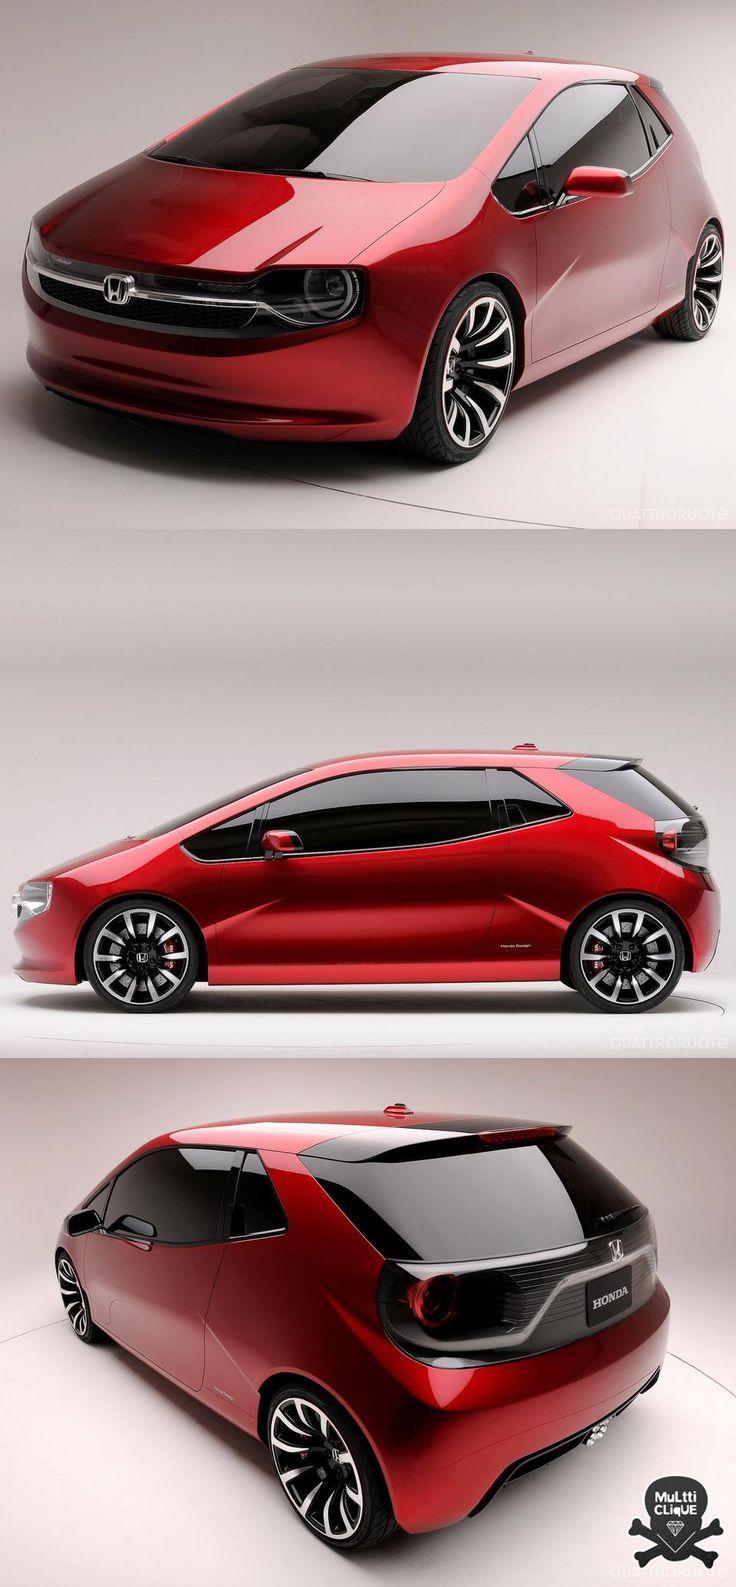 Honda concept